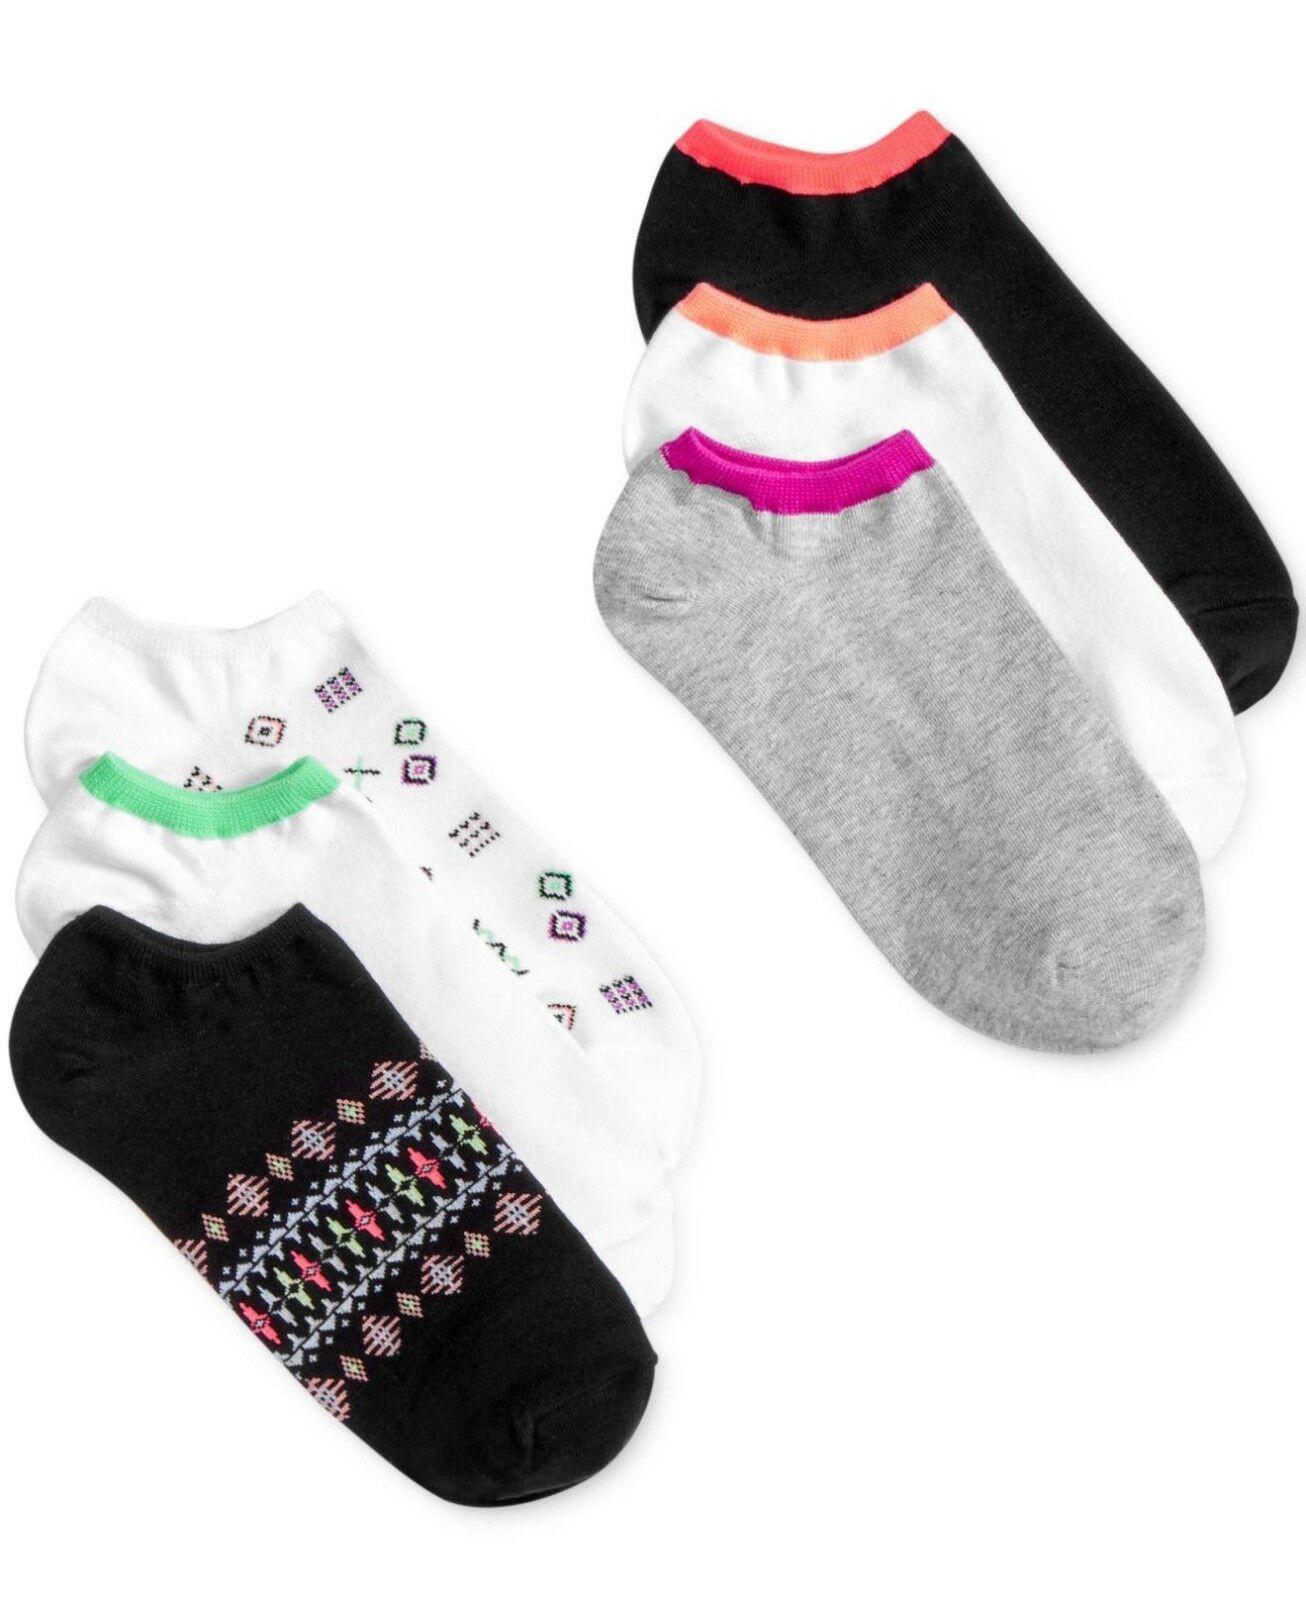 6-pairs HUE Cotton Liner Sport Socks Geo Pack OS